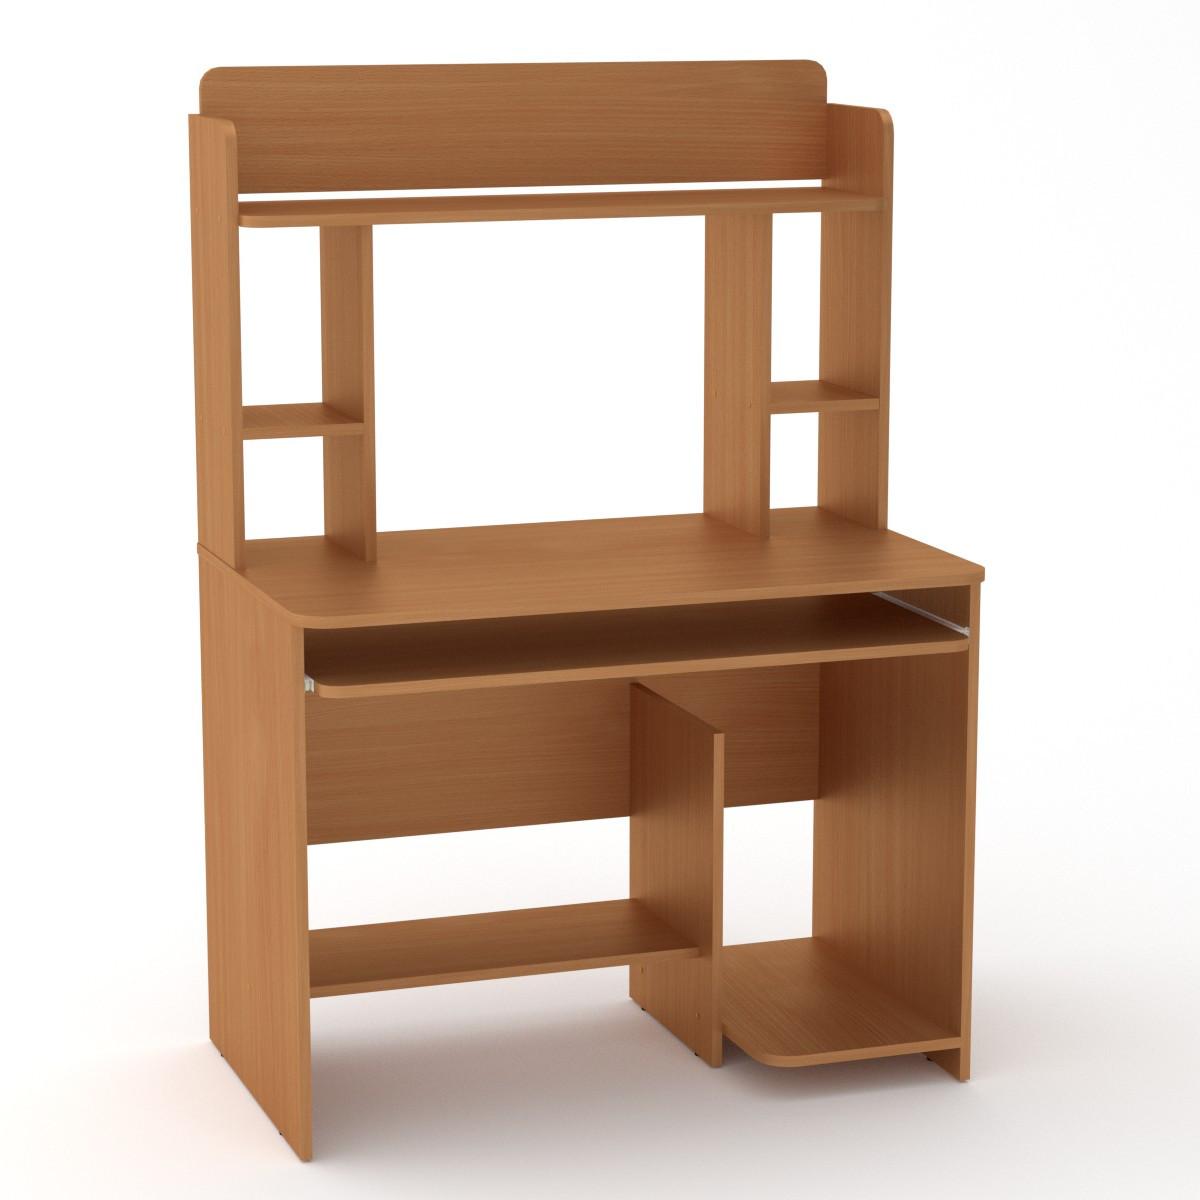 Стол компьютерный СКМ-6 бук Компанит (100х60х144 см)